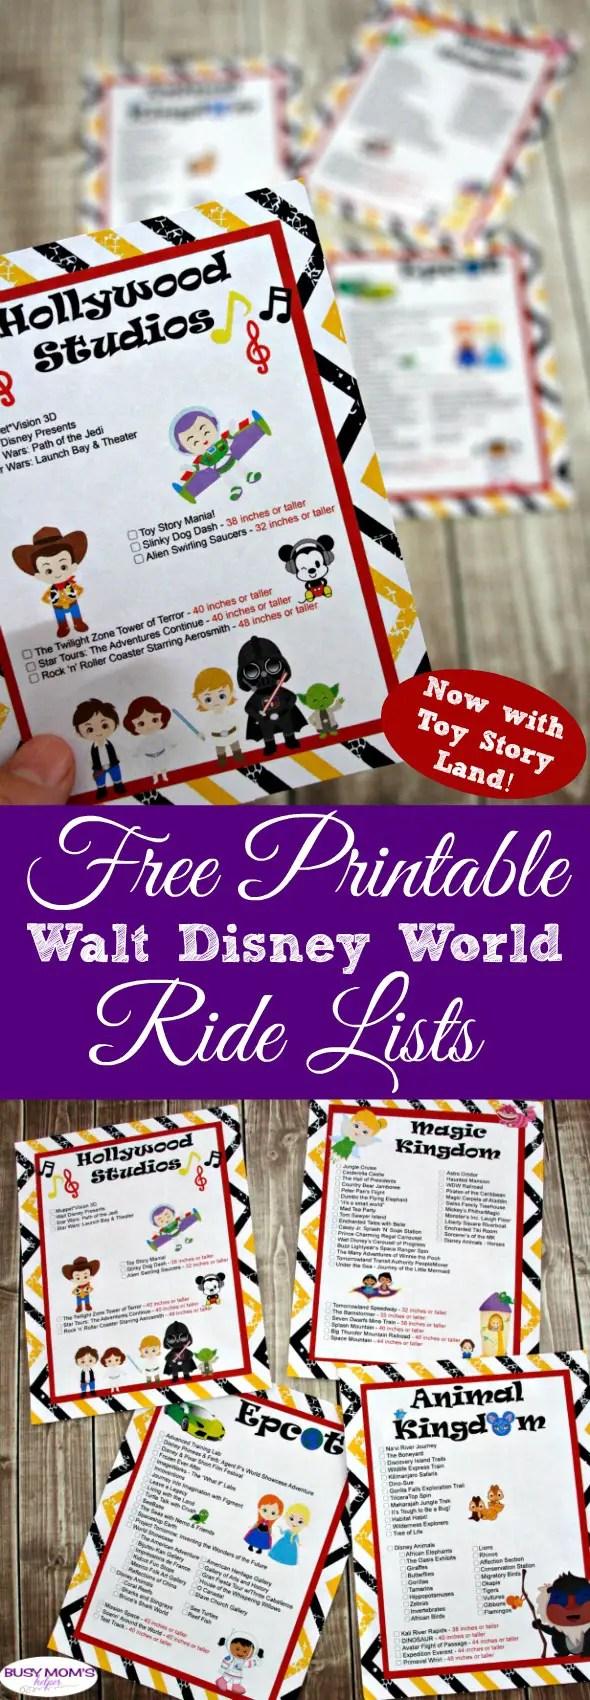 Updated Printable Walt Disney World Ride List now including Toy Story Land! #wdw #freeprintable #printable #waltdisneyworld #disney #ridelist #themepark #travel #family #magickingdom #epcot #hollywoodstudios #animalkingdom